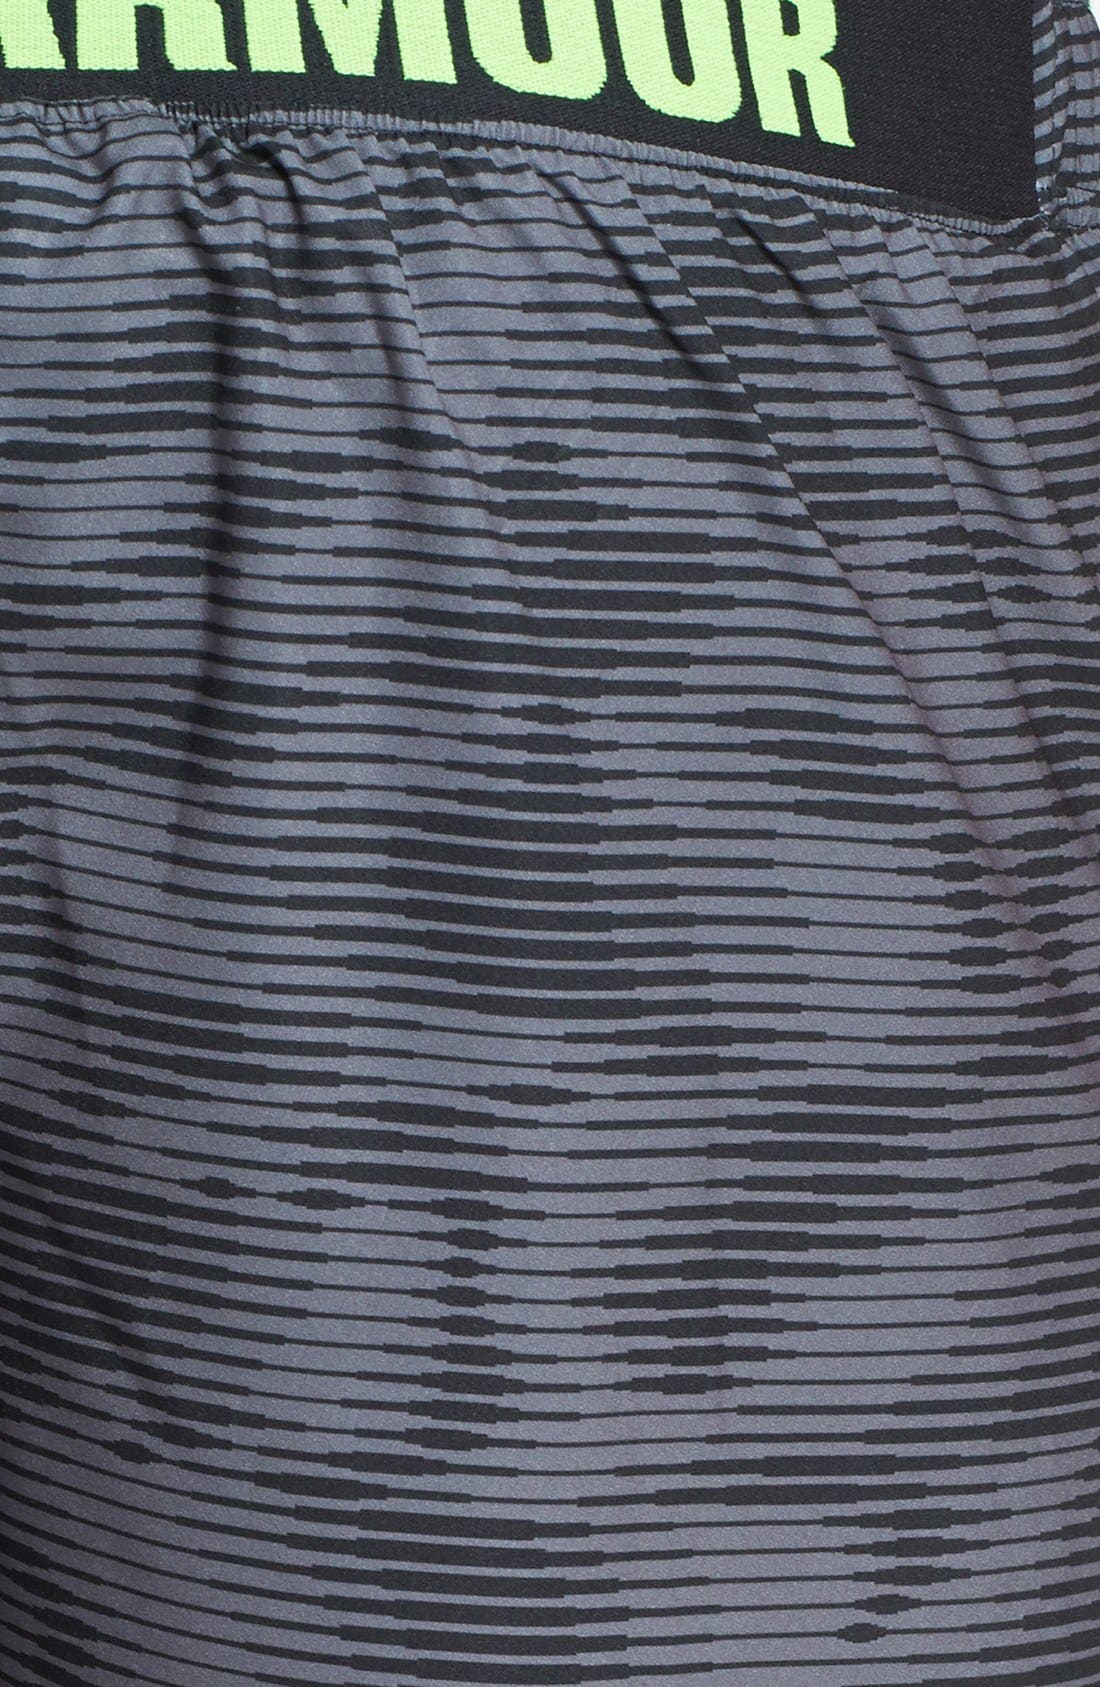 Alternate Image 3  - Under Armour 'Mirage' HeatGear® Woven Shorts